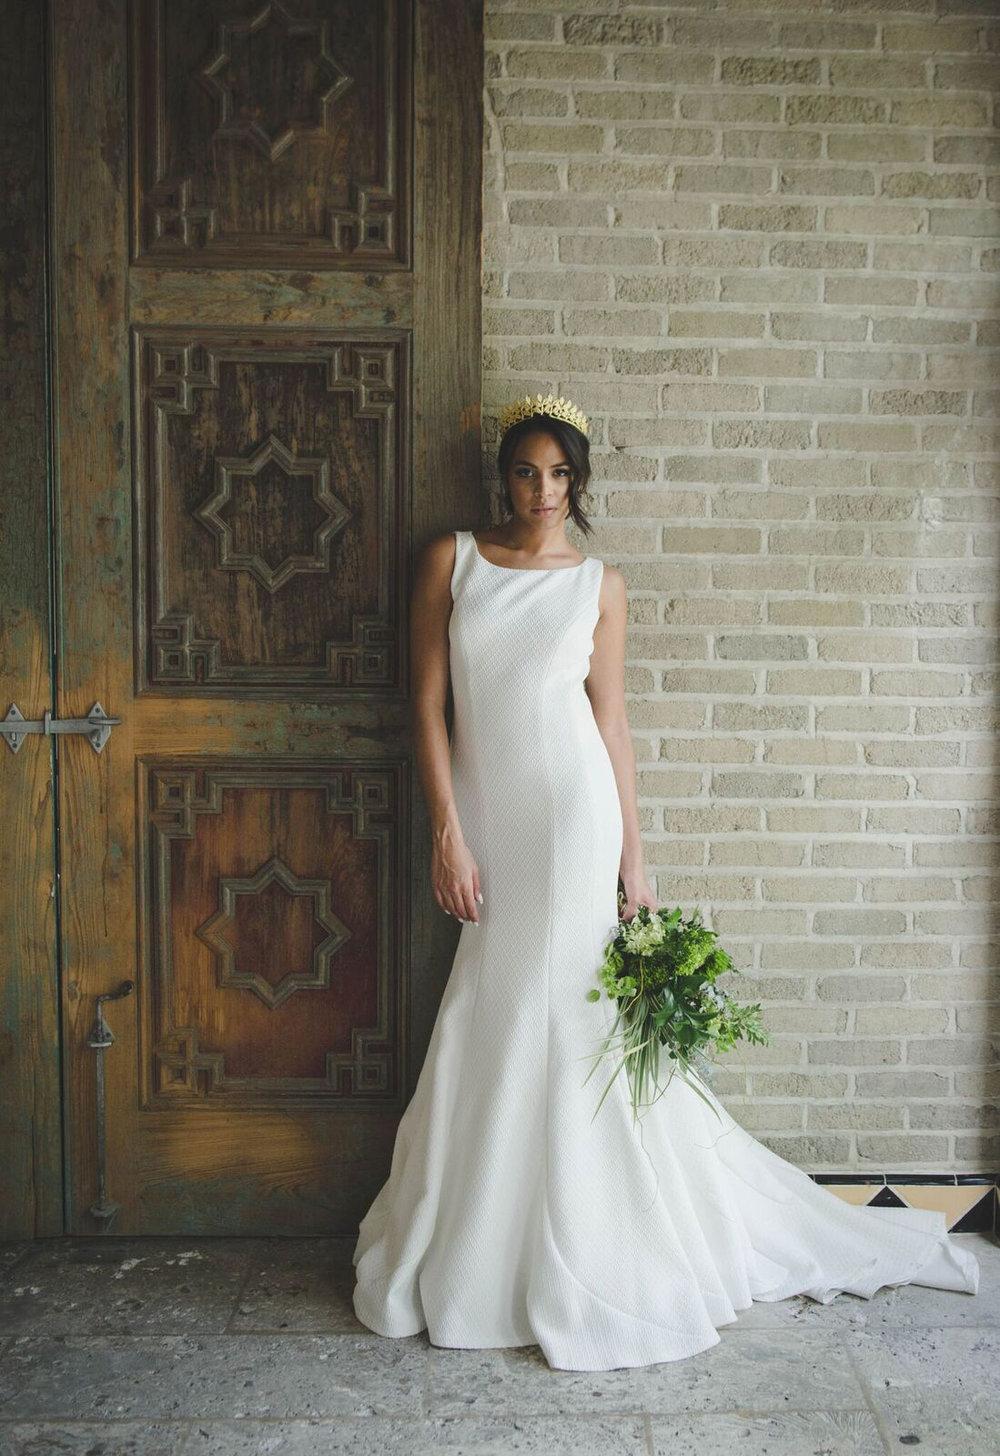 amora_beauty_studio_bridal_woman_wedding_dress.jpg